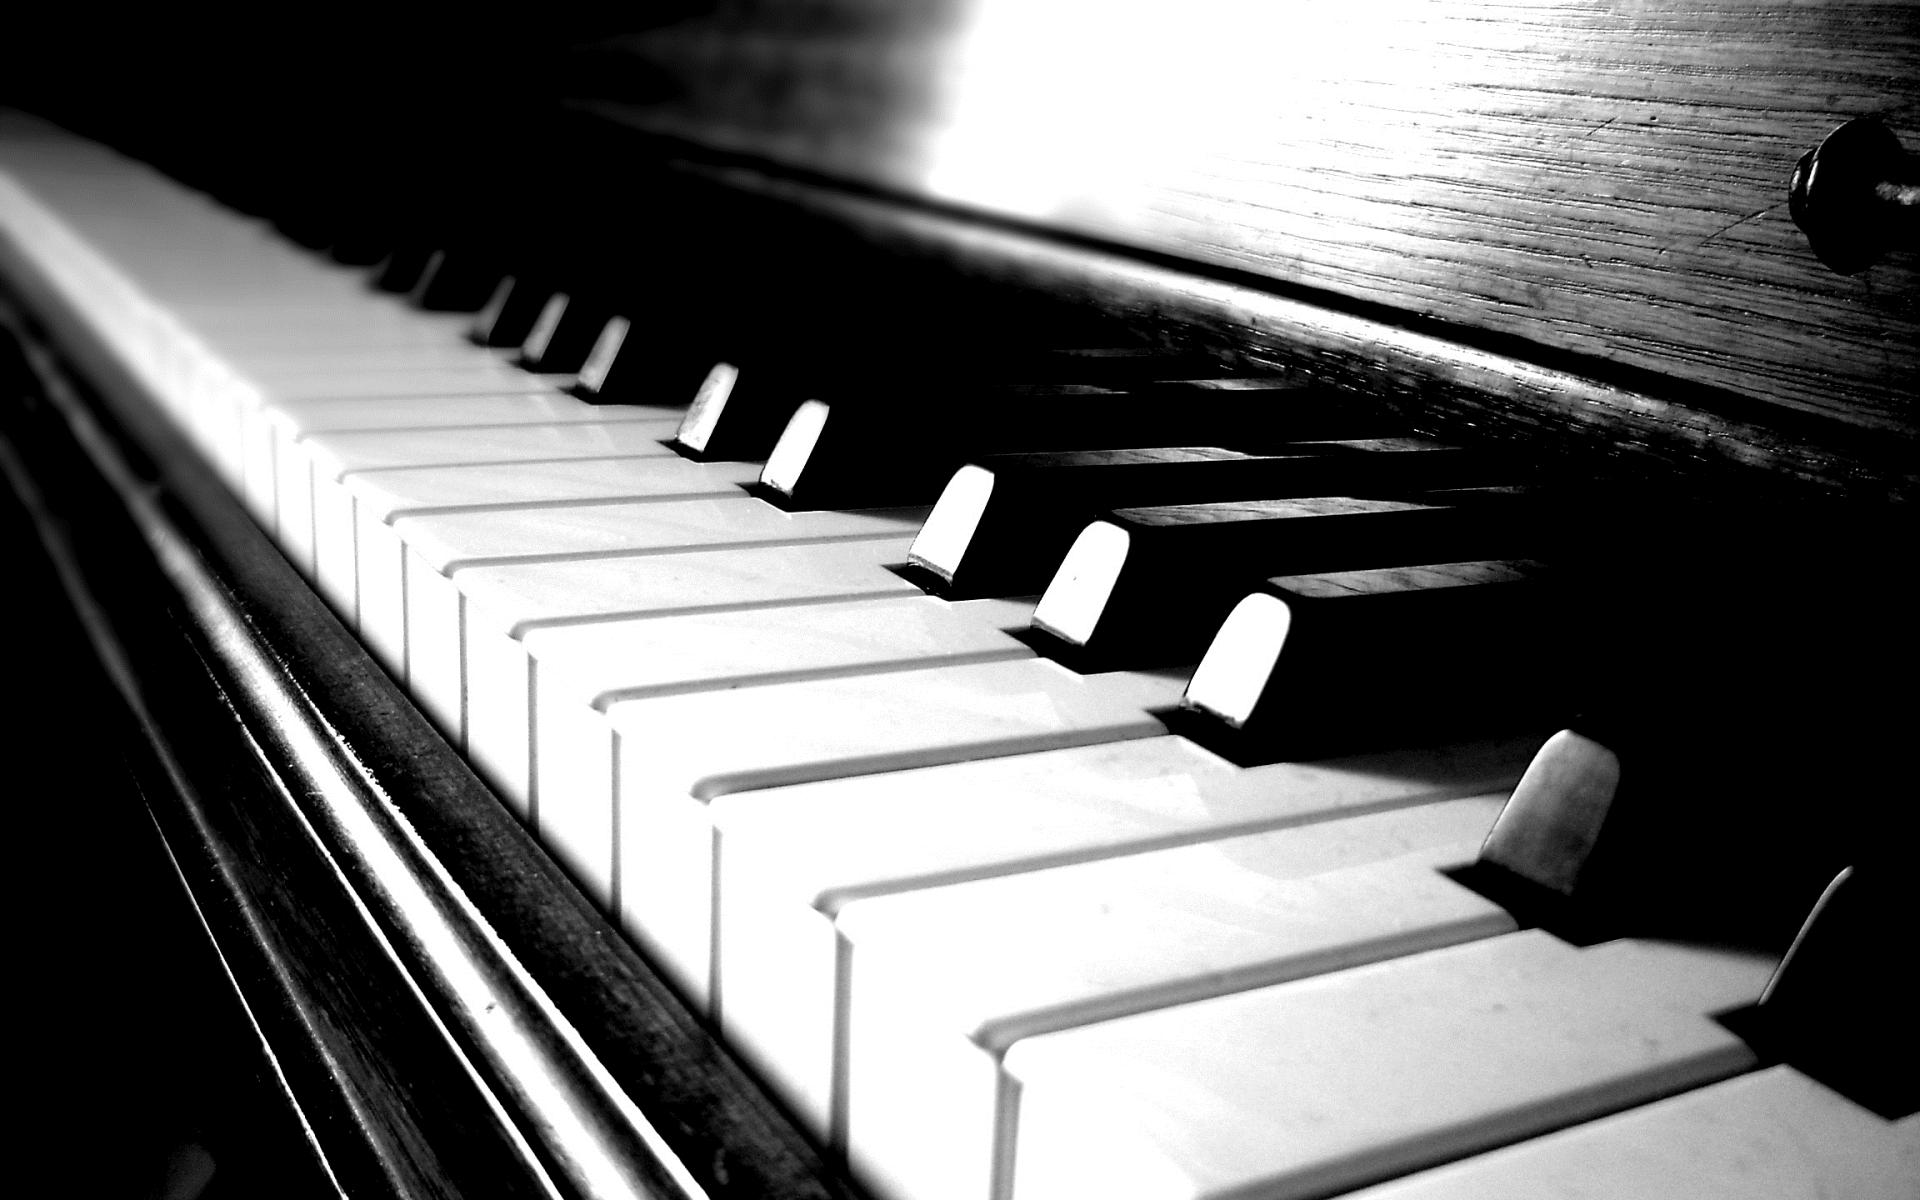 piano_wallpaper_jpeg-wide.jpg